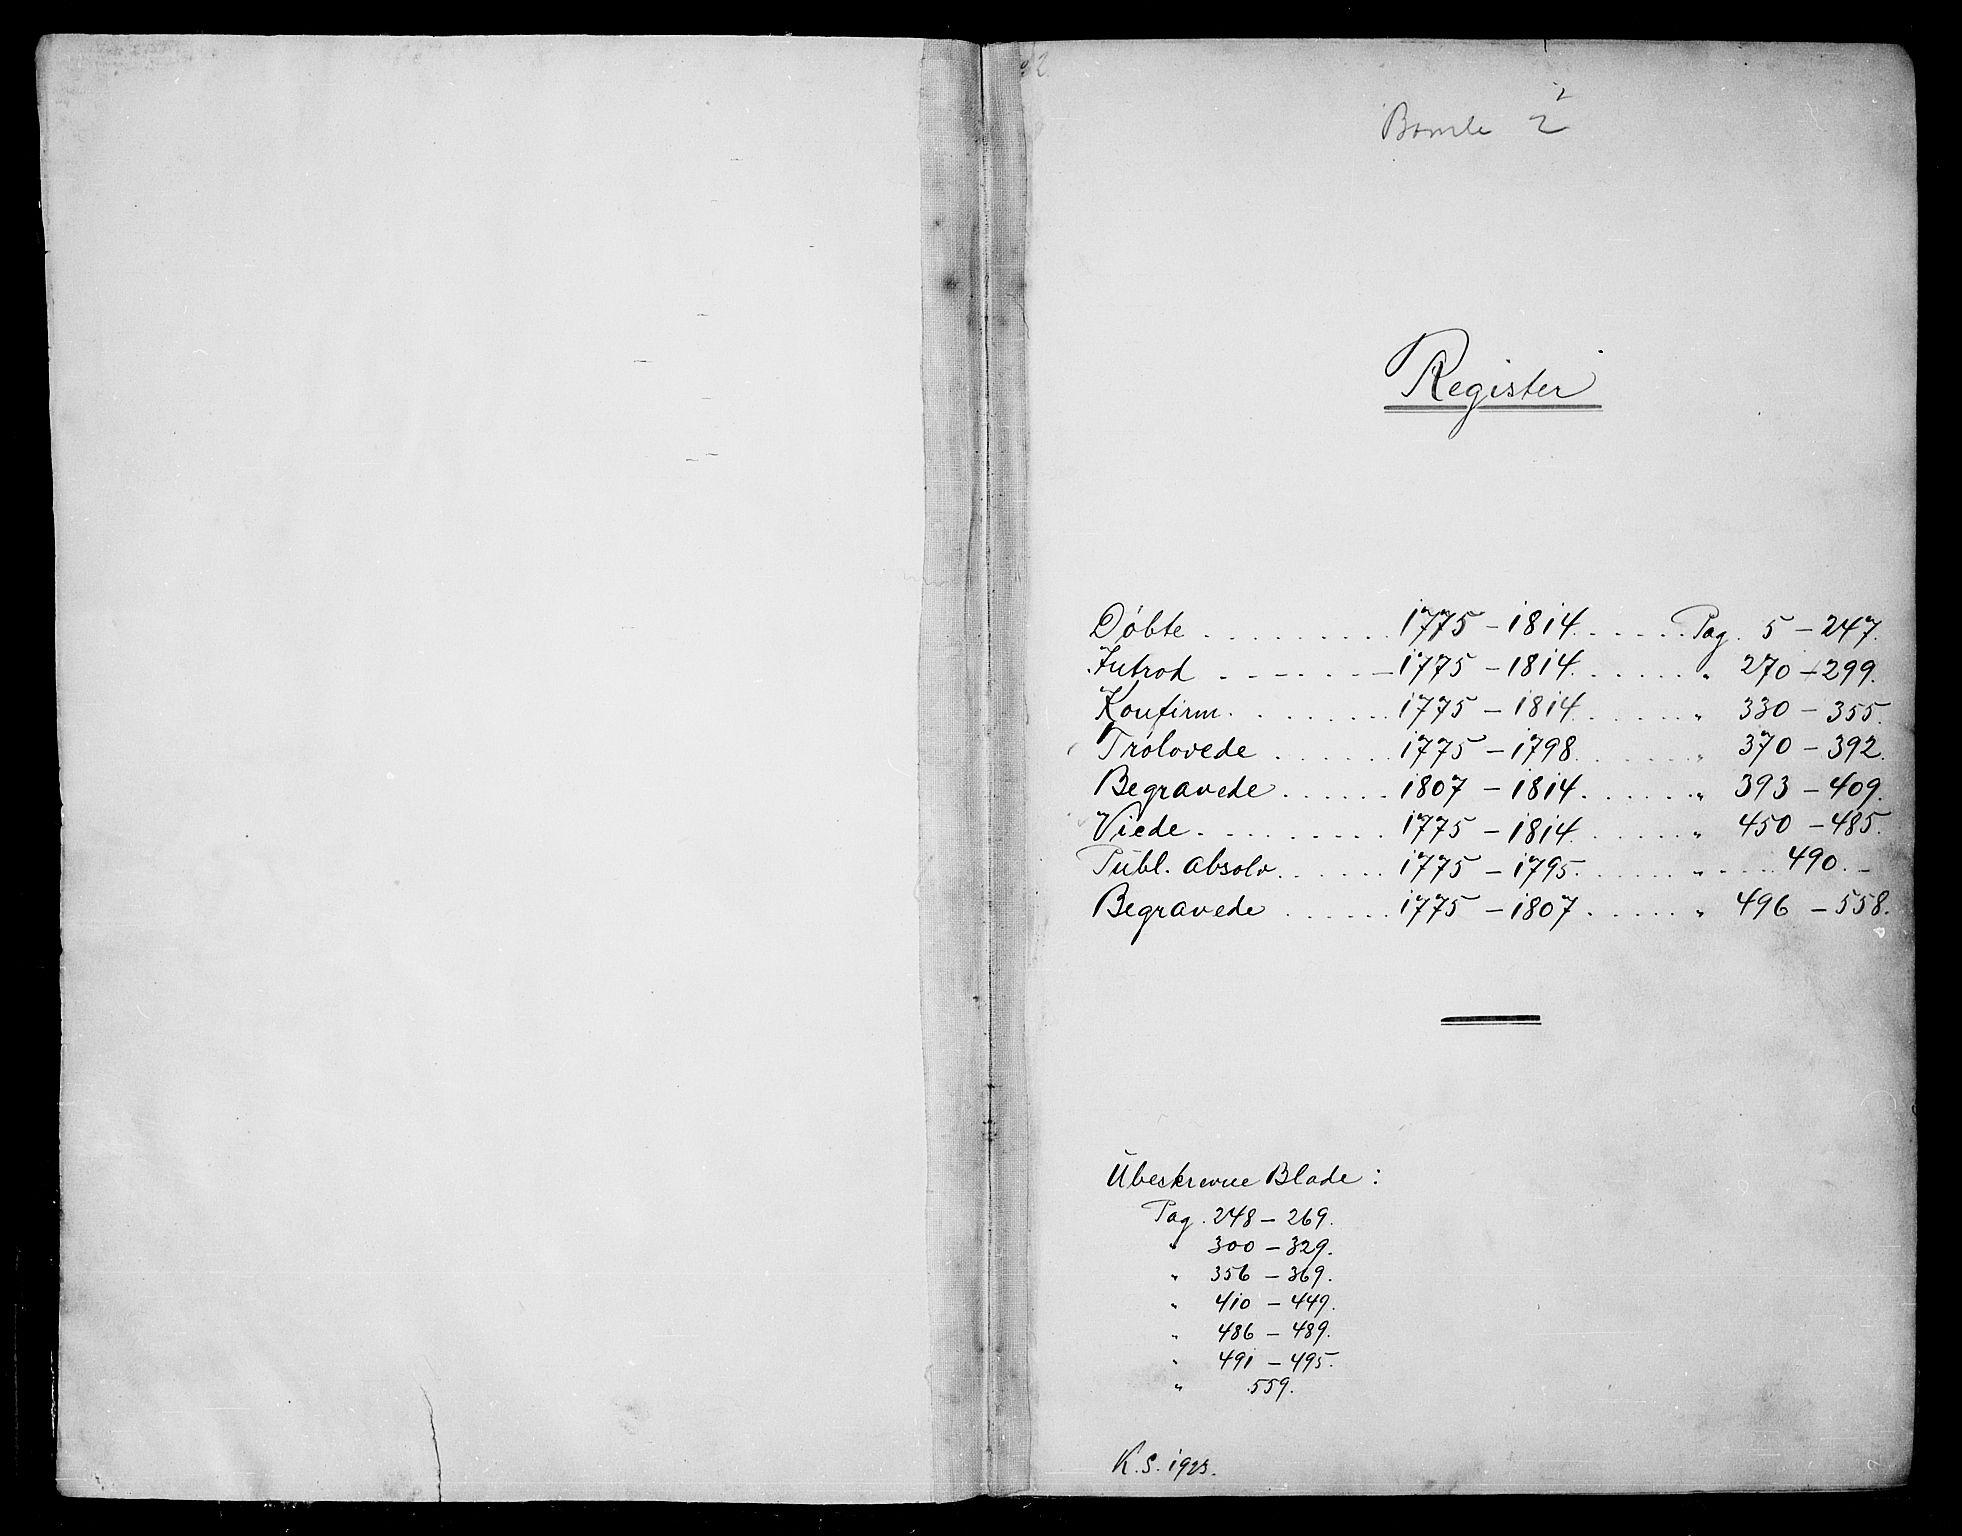 SAKO, Bamble kirkebøker, F/Fa/L0002: Ministerialbok nr. I 2, 1775-1814